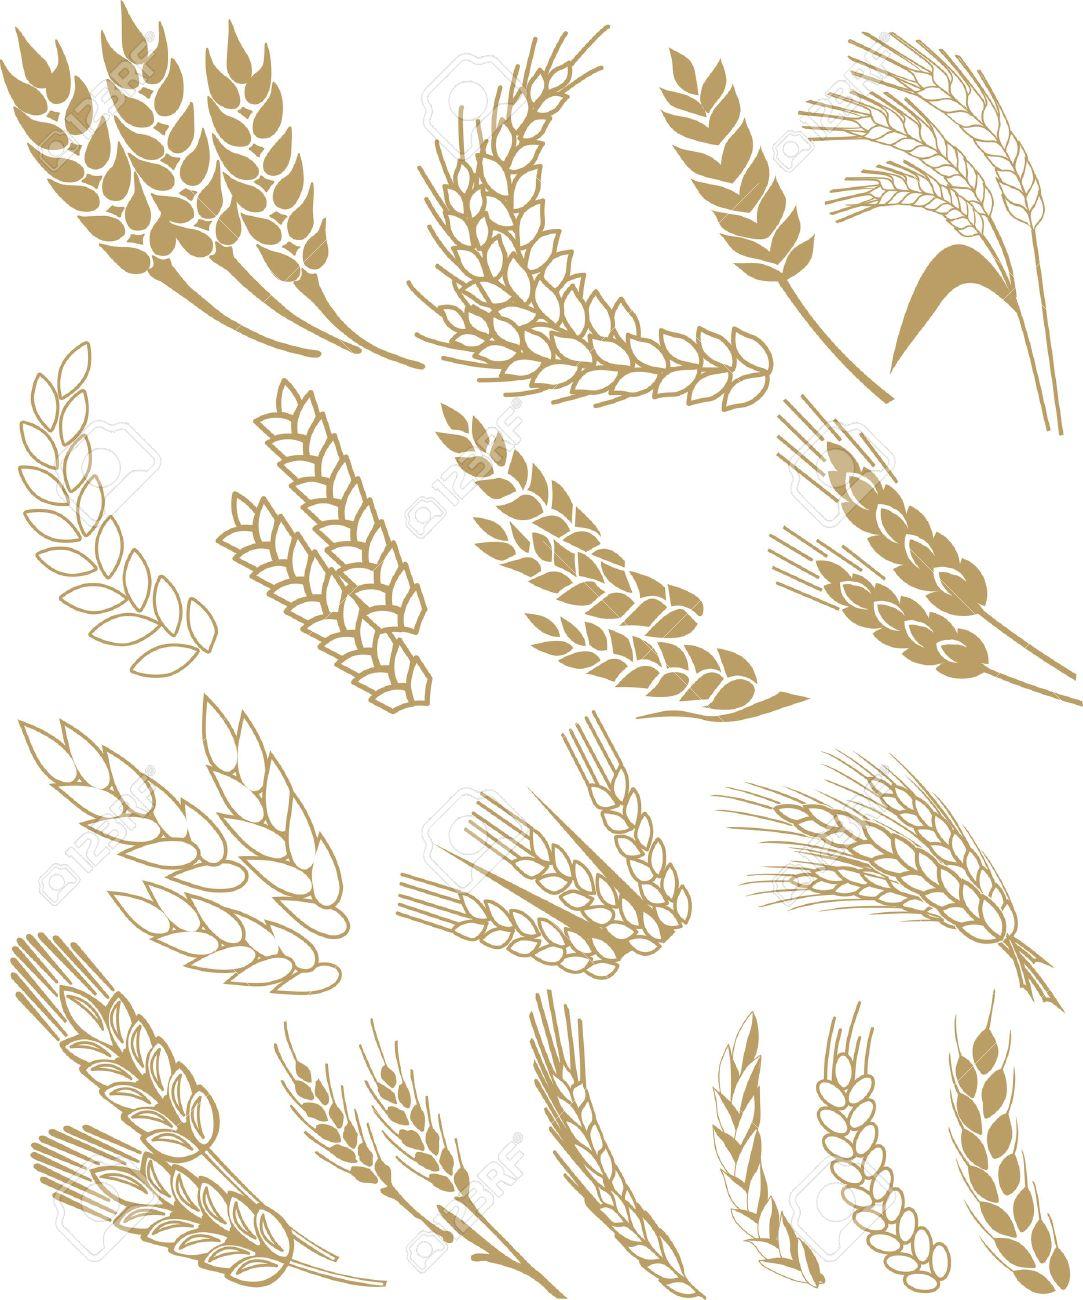 wheat ears Stock Vector - 3786751